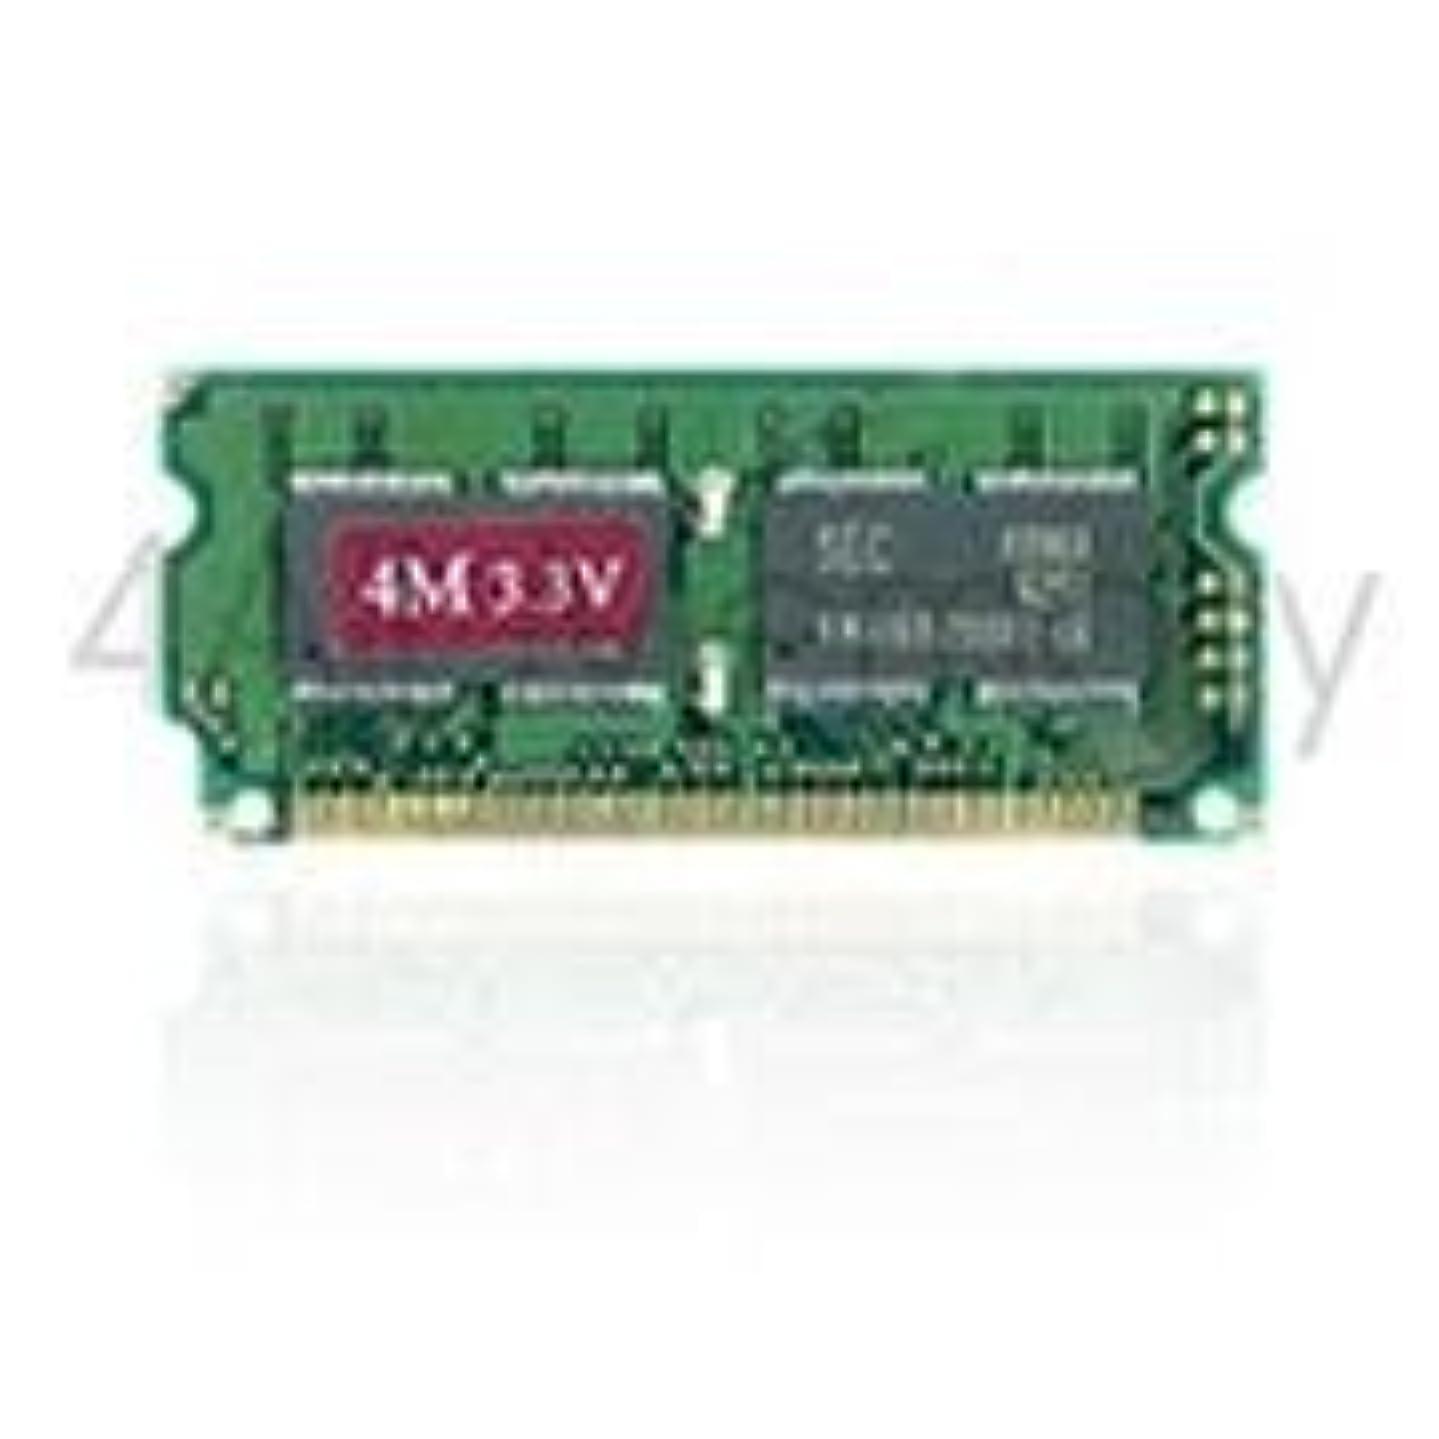 32MB 60ns FPM SIMM 5v 72-pin RAM Memory Upgrade for the Br HL Series HL-1440